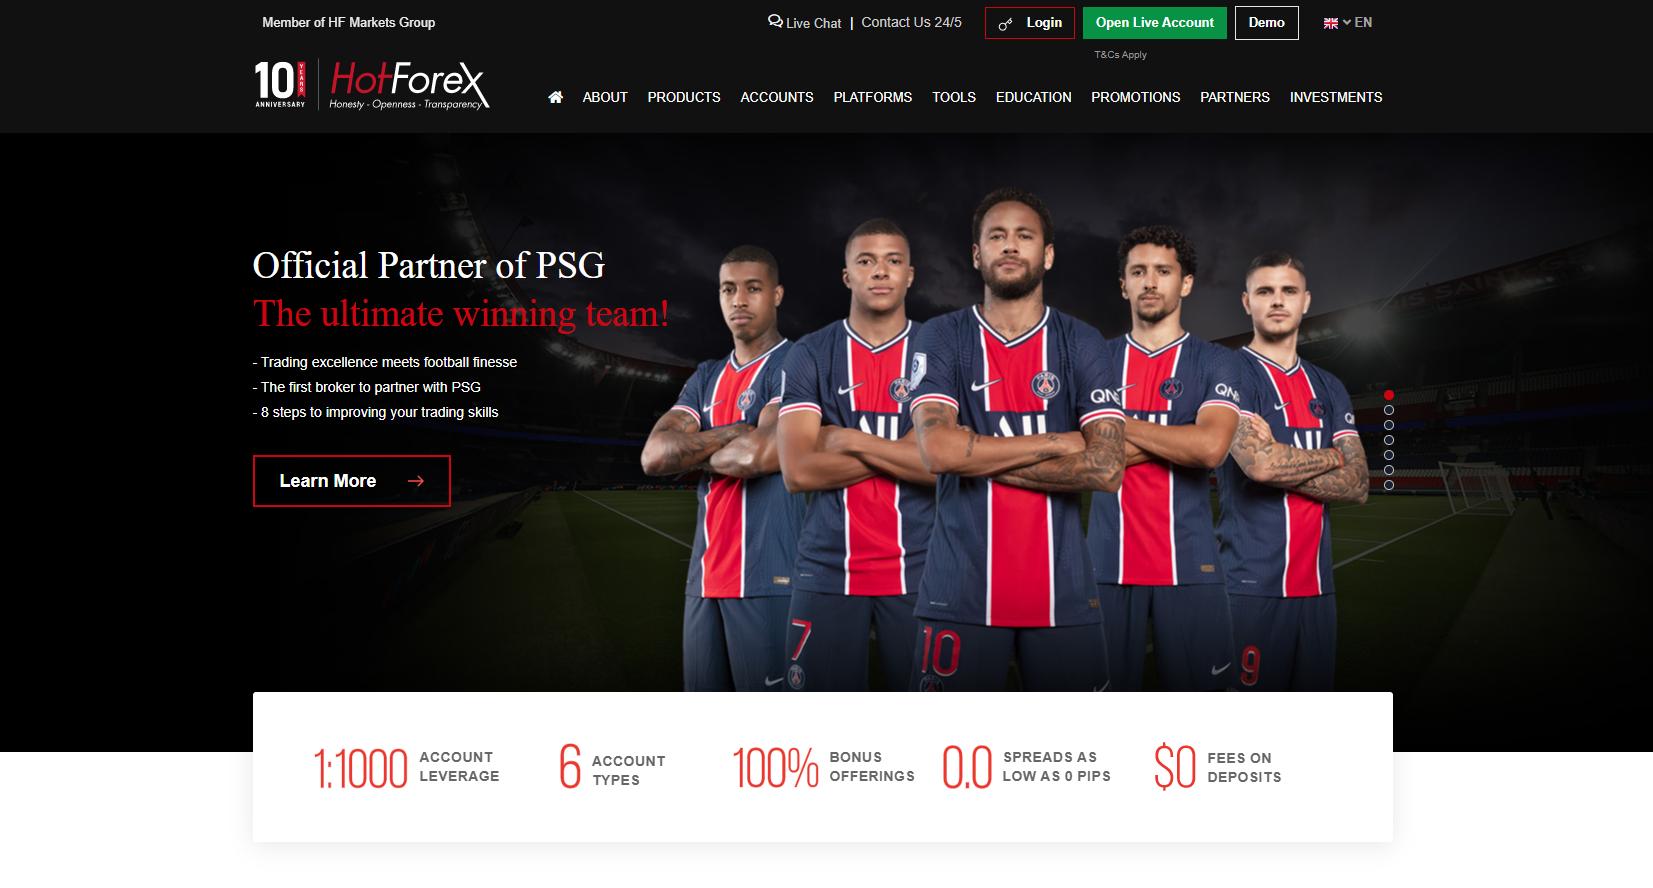 Sitio web oficial de HotForex